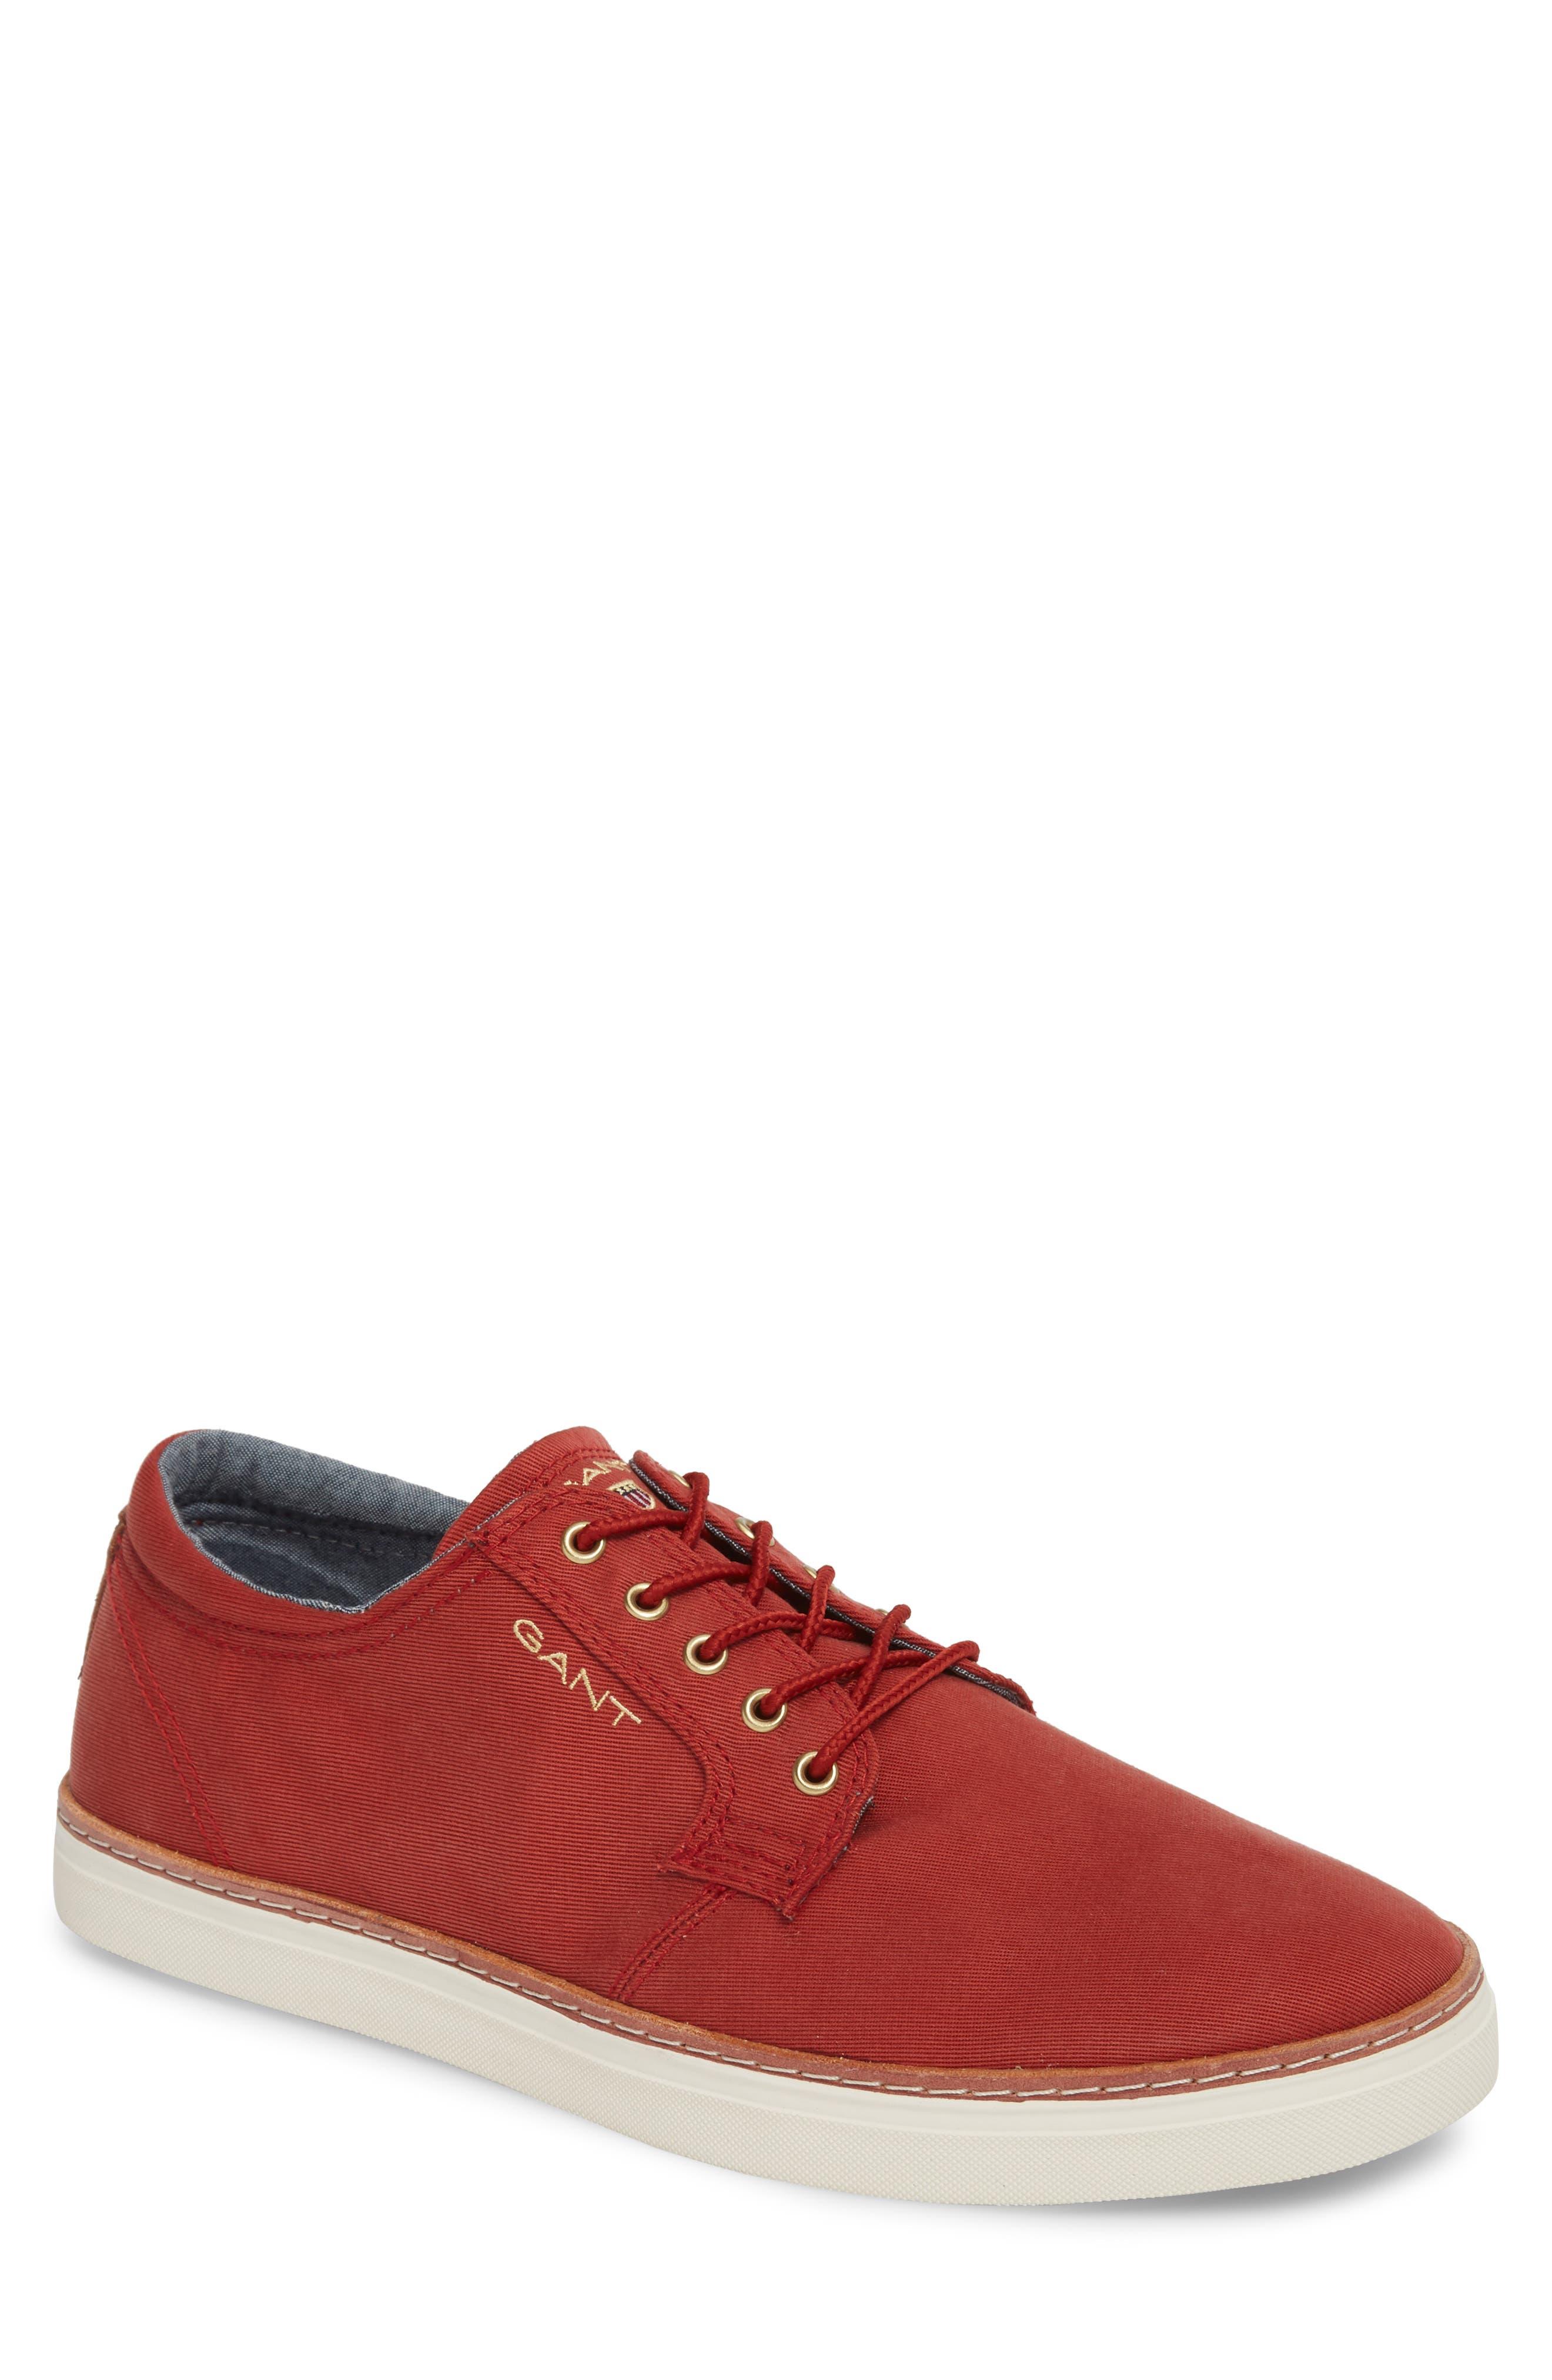 Bari Sneaker,                             Main thumbnail 1, color,                             RED TWILL